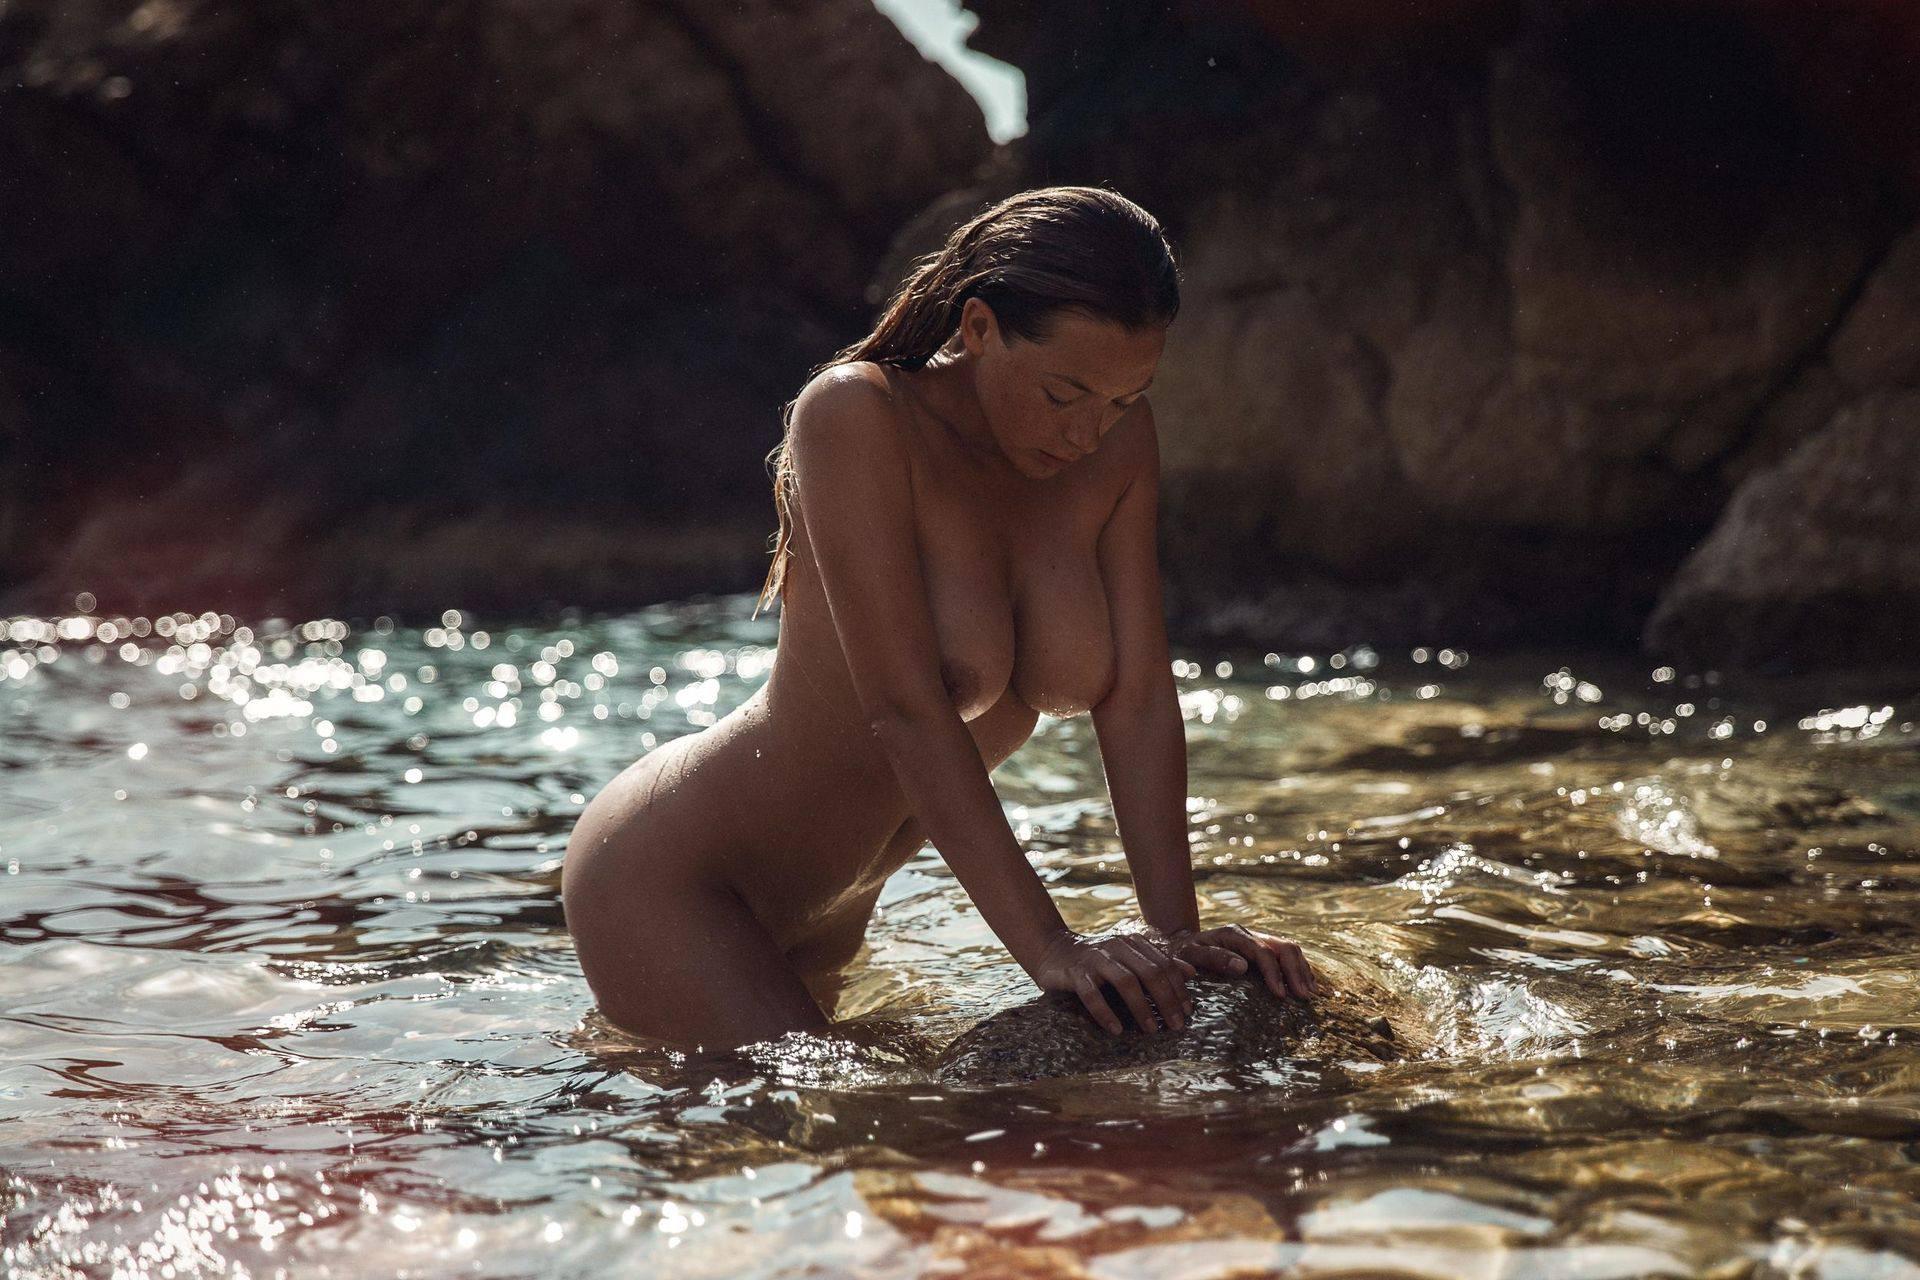 Olga Kobzar – Hot Big Boobs In Sexy Full Frontal Nude Photoshoot By Thomas Agatz (nsfw) 0010